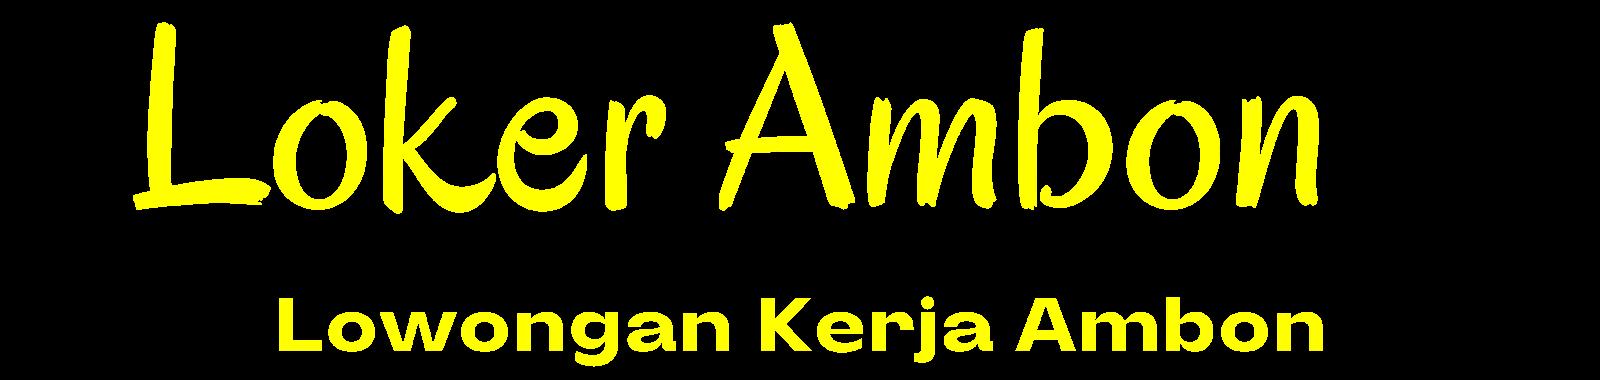 Loker Ambon - Lowongan Kerja Ambon 2021